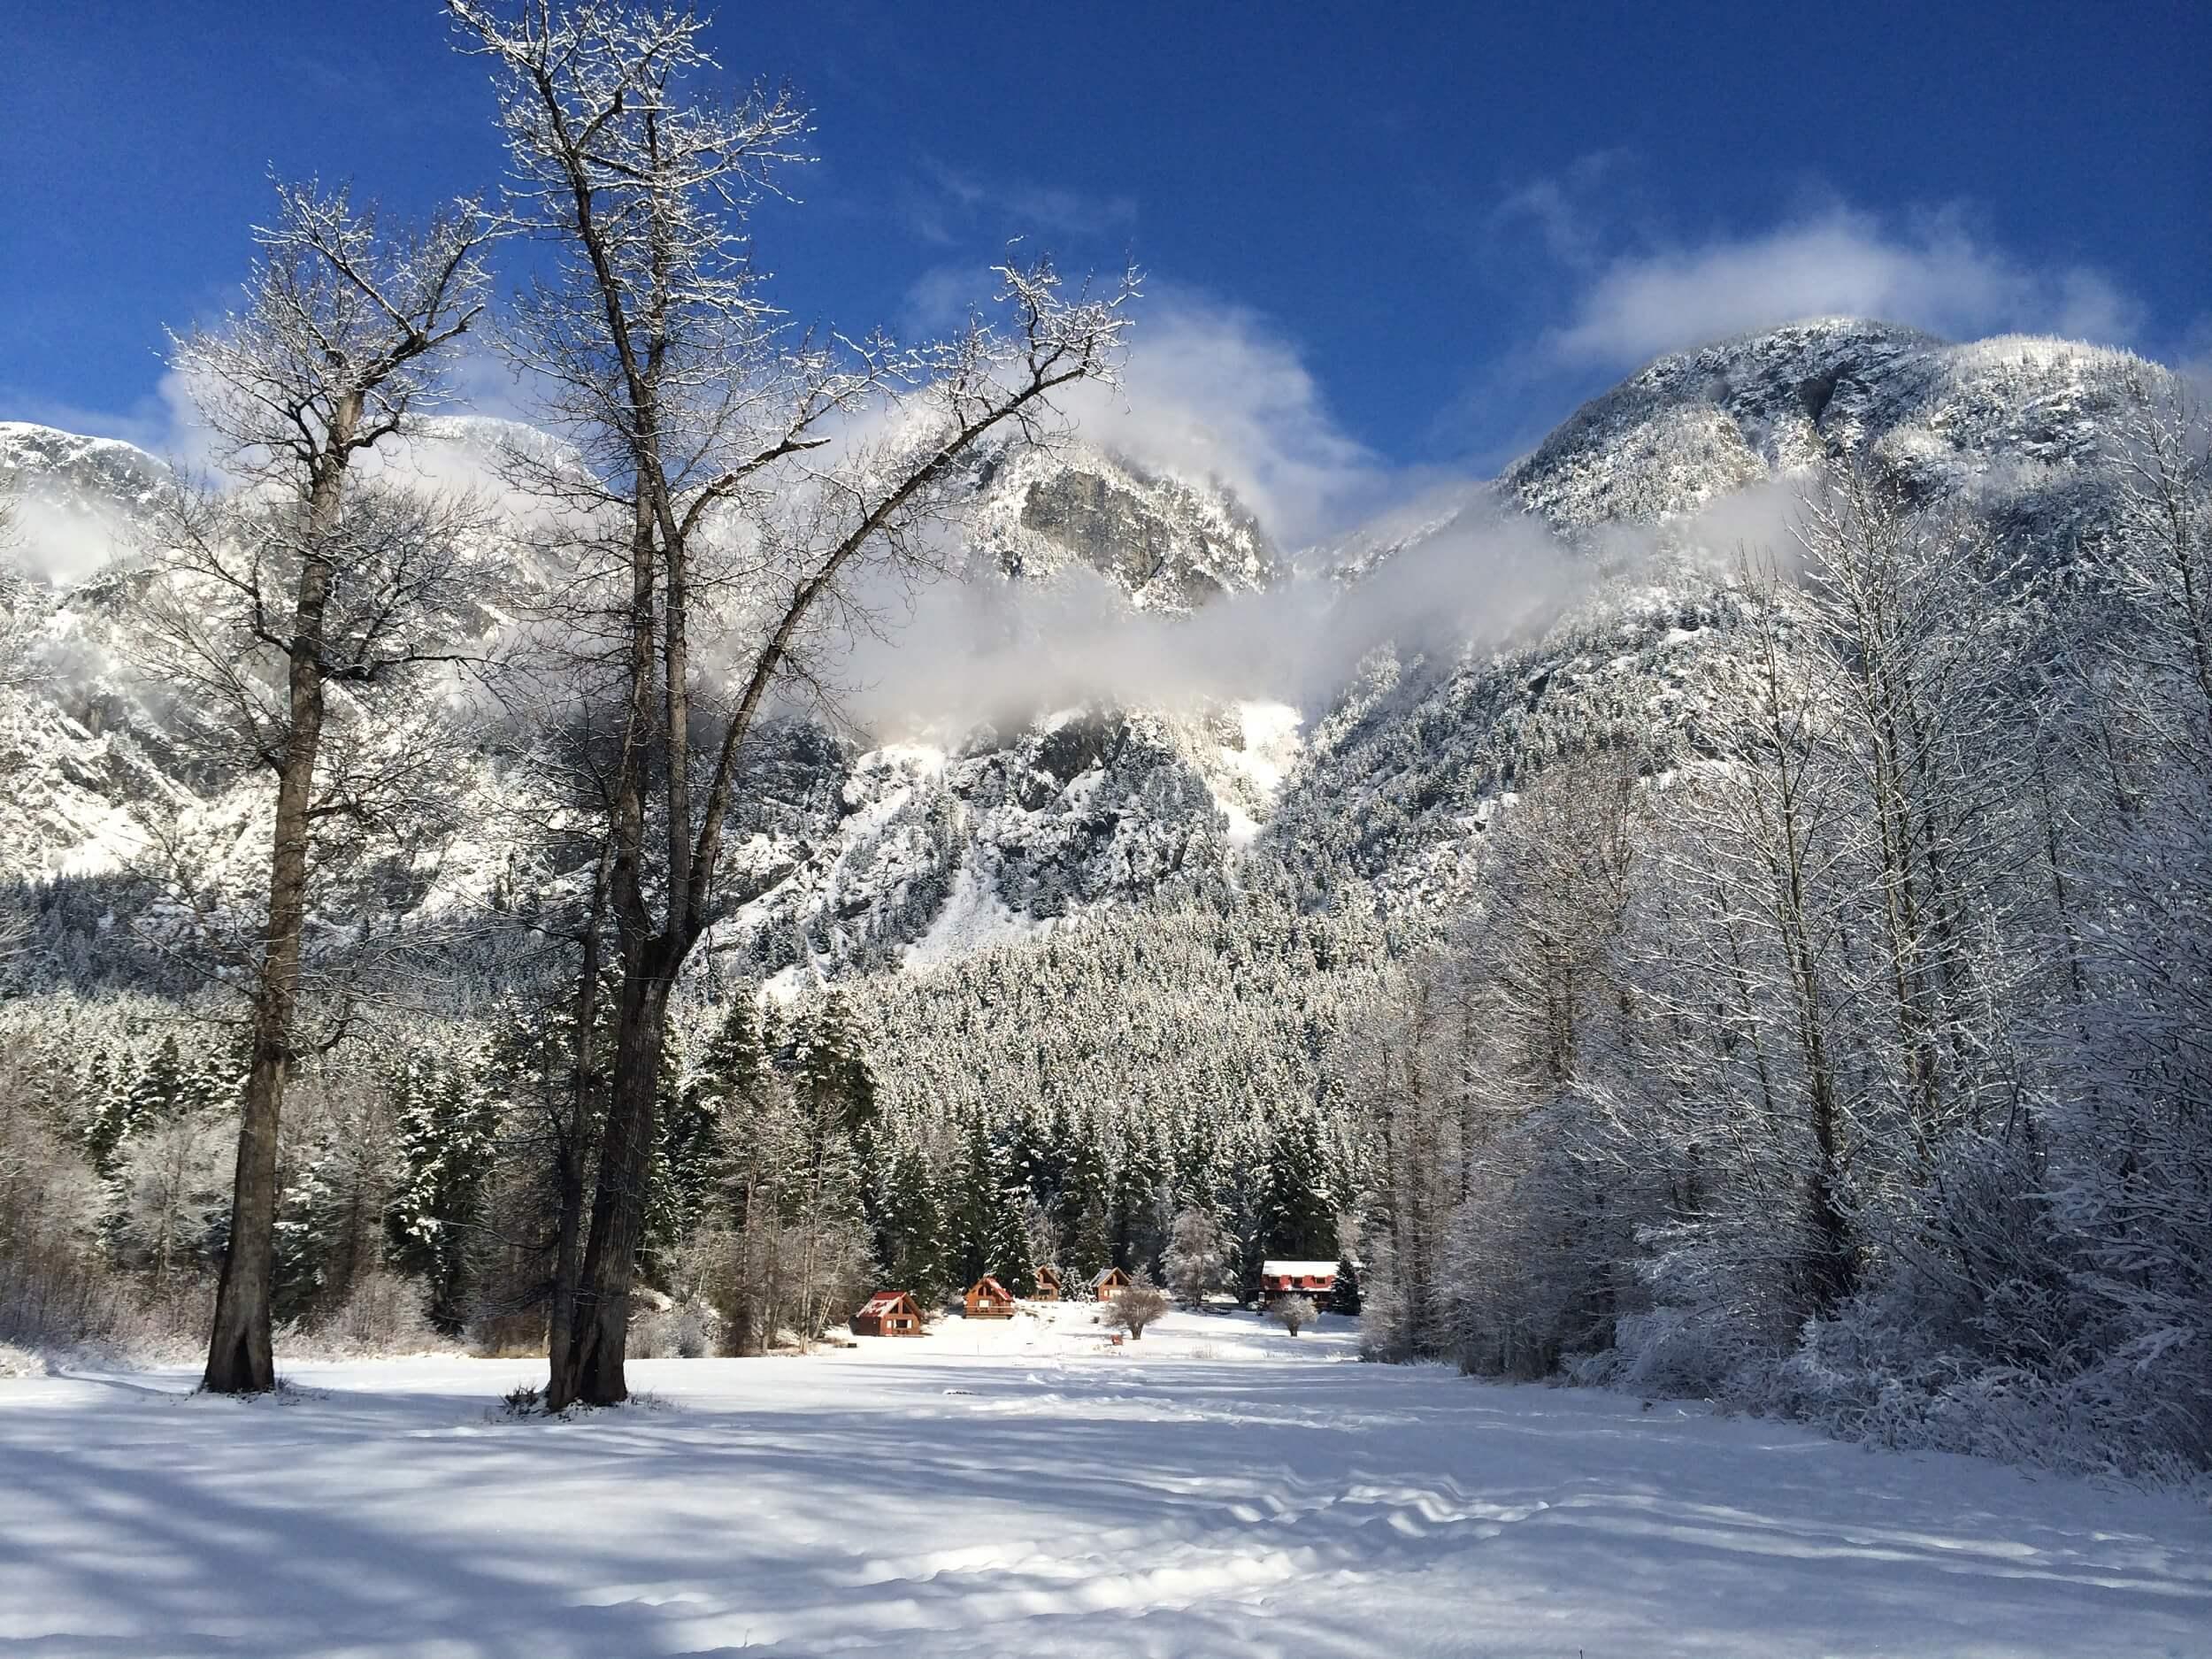 Sunny winter wonderland day at Bella Coola Heli Sports by Emilia Jacklin.jpg